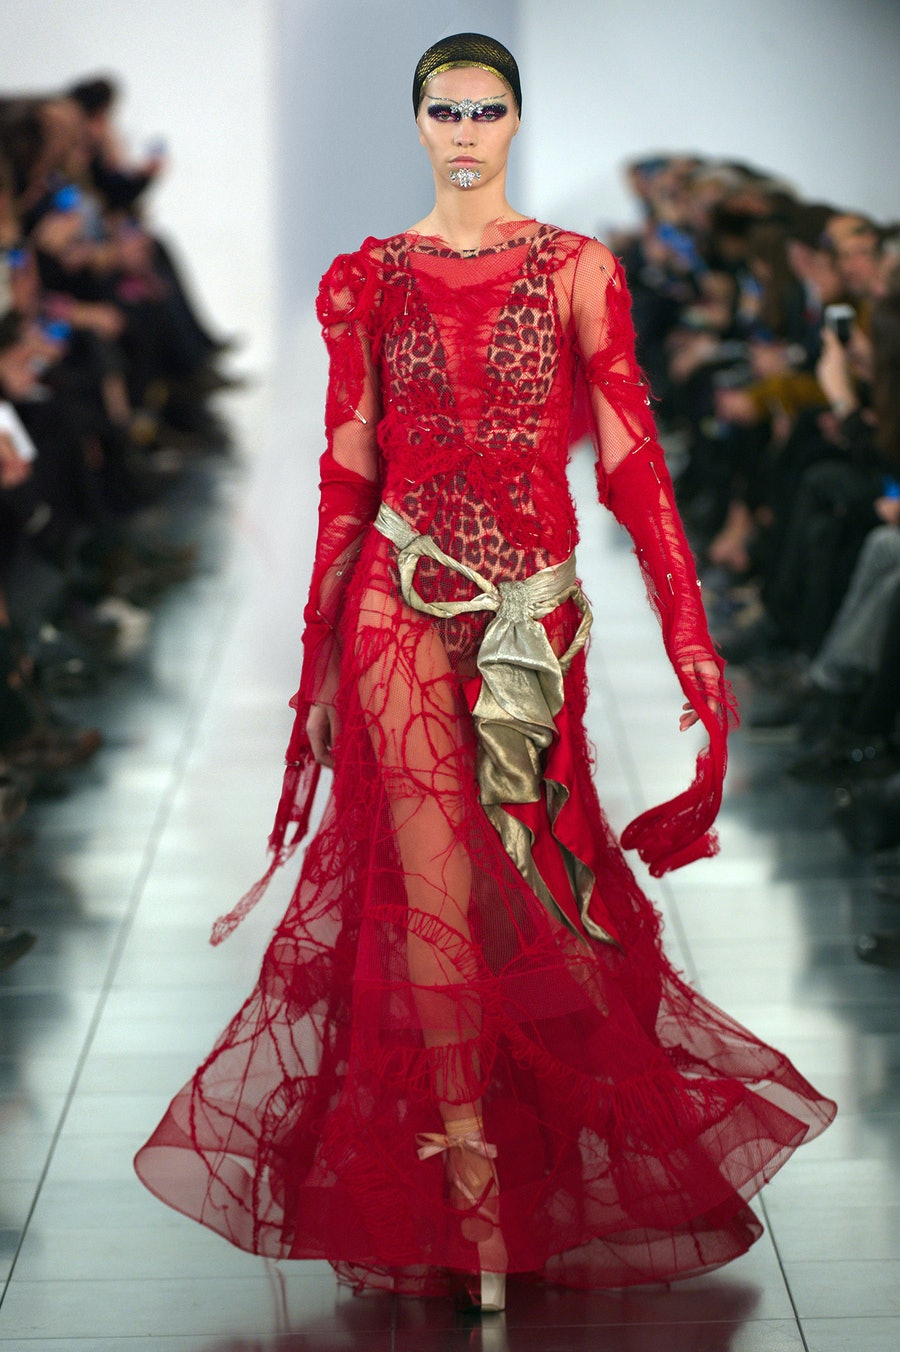 Maison Margiela Spring 2015 Couture